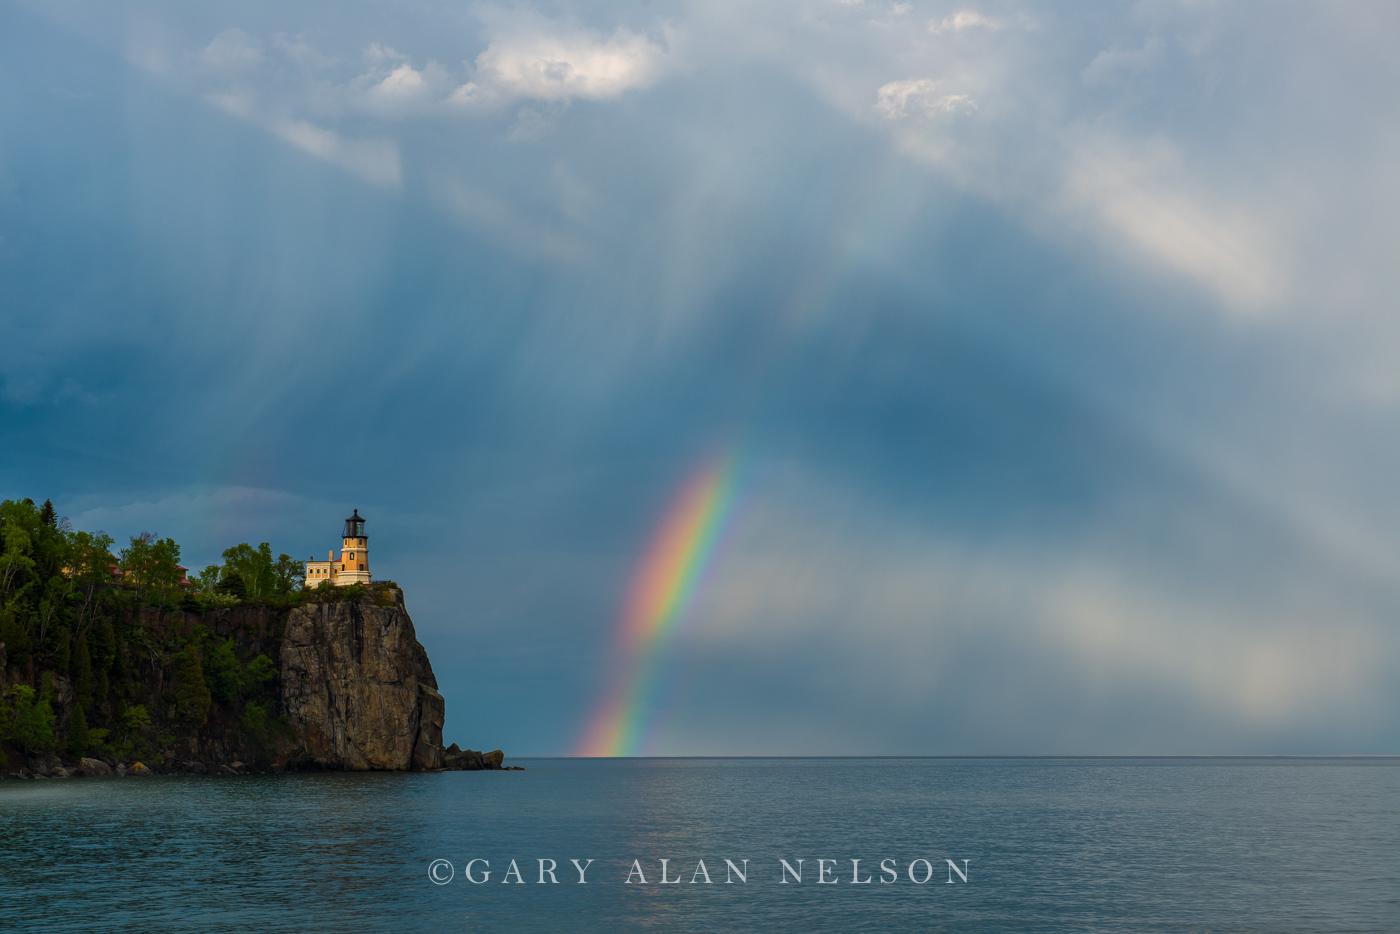 lake superior, split rock, minnesota, rainbow, lighthouse, photo